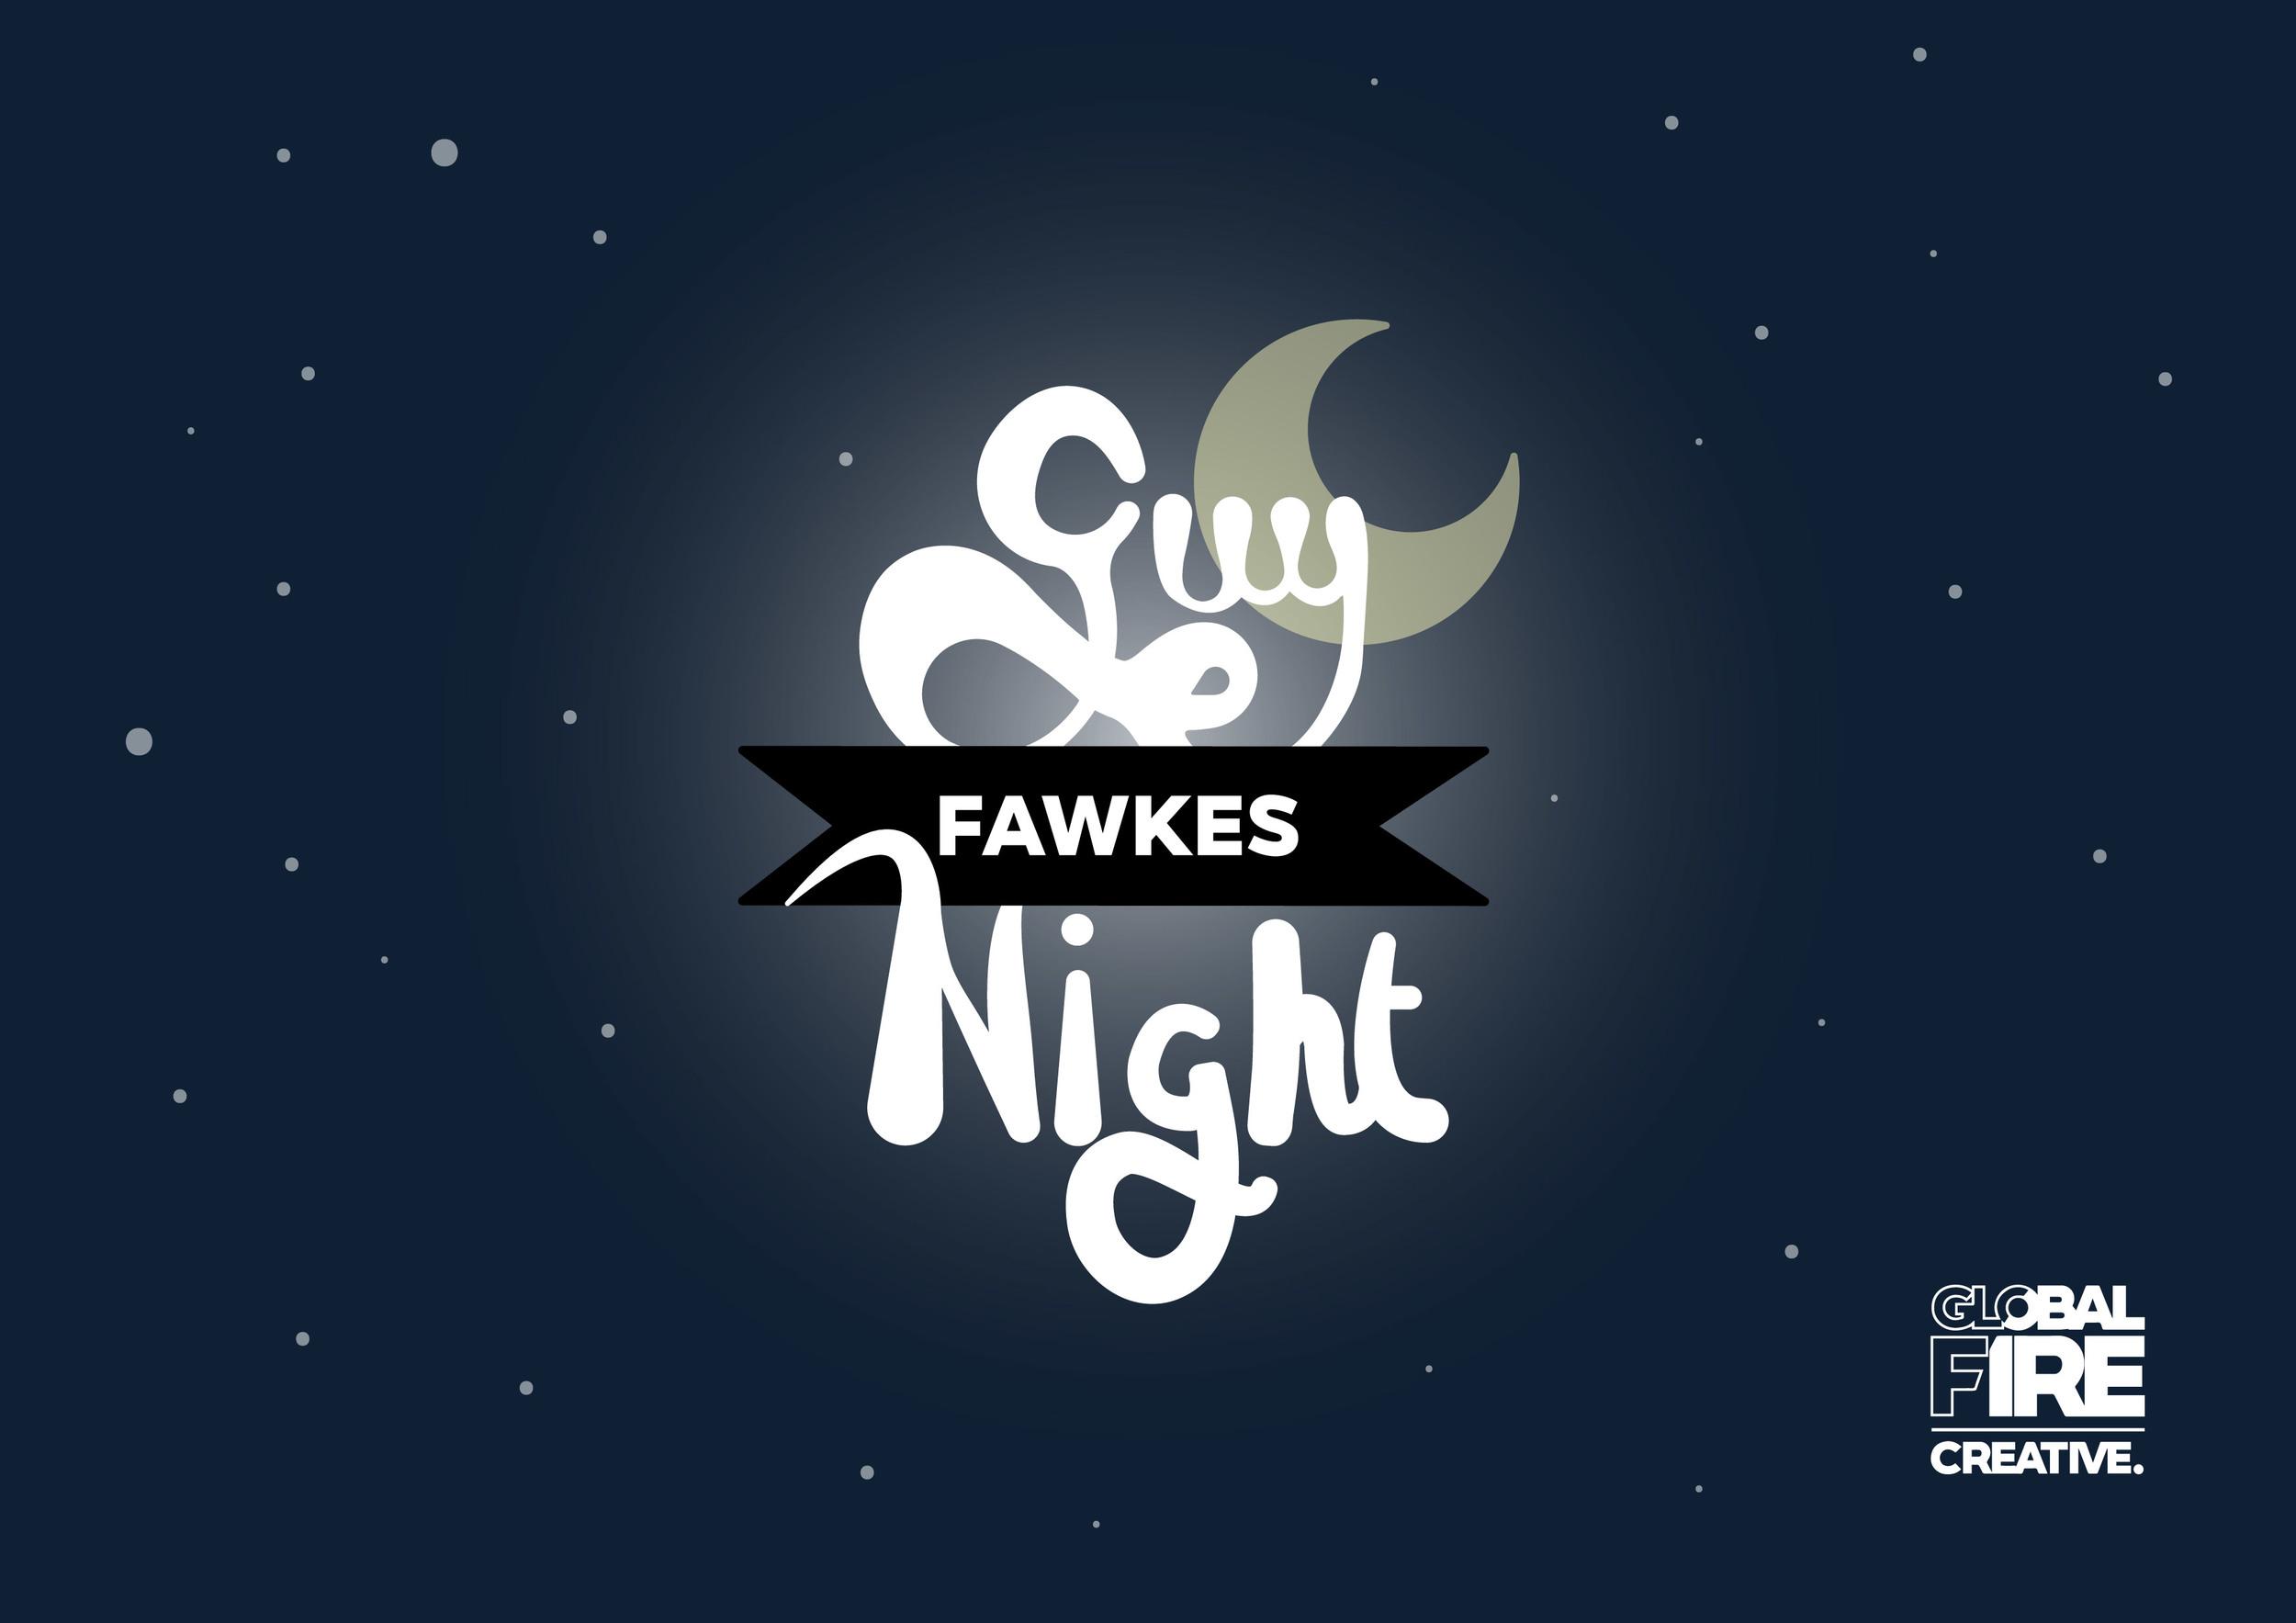 guy fawkes3-01.jpg